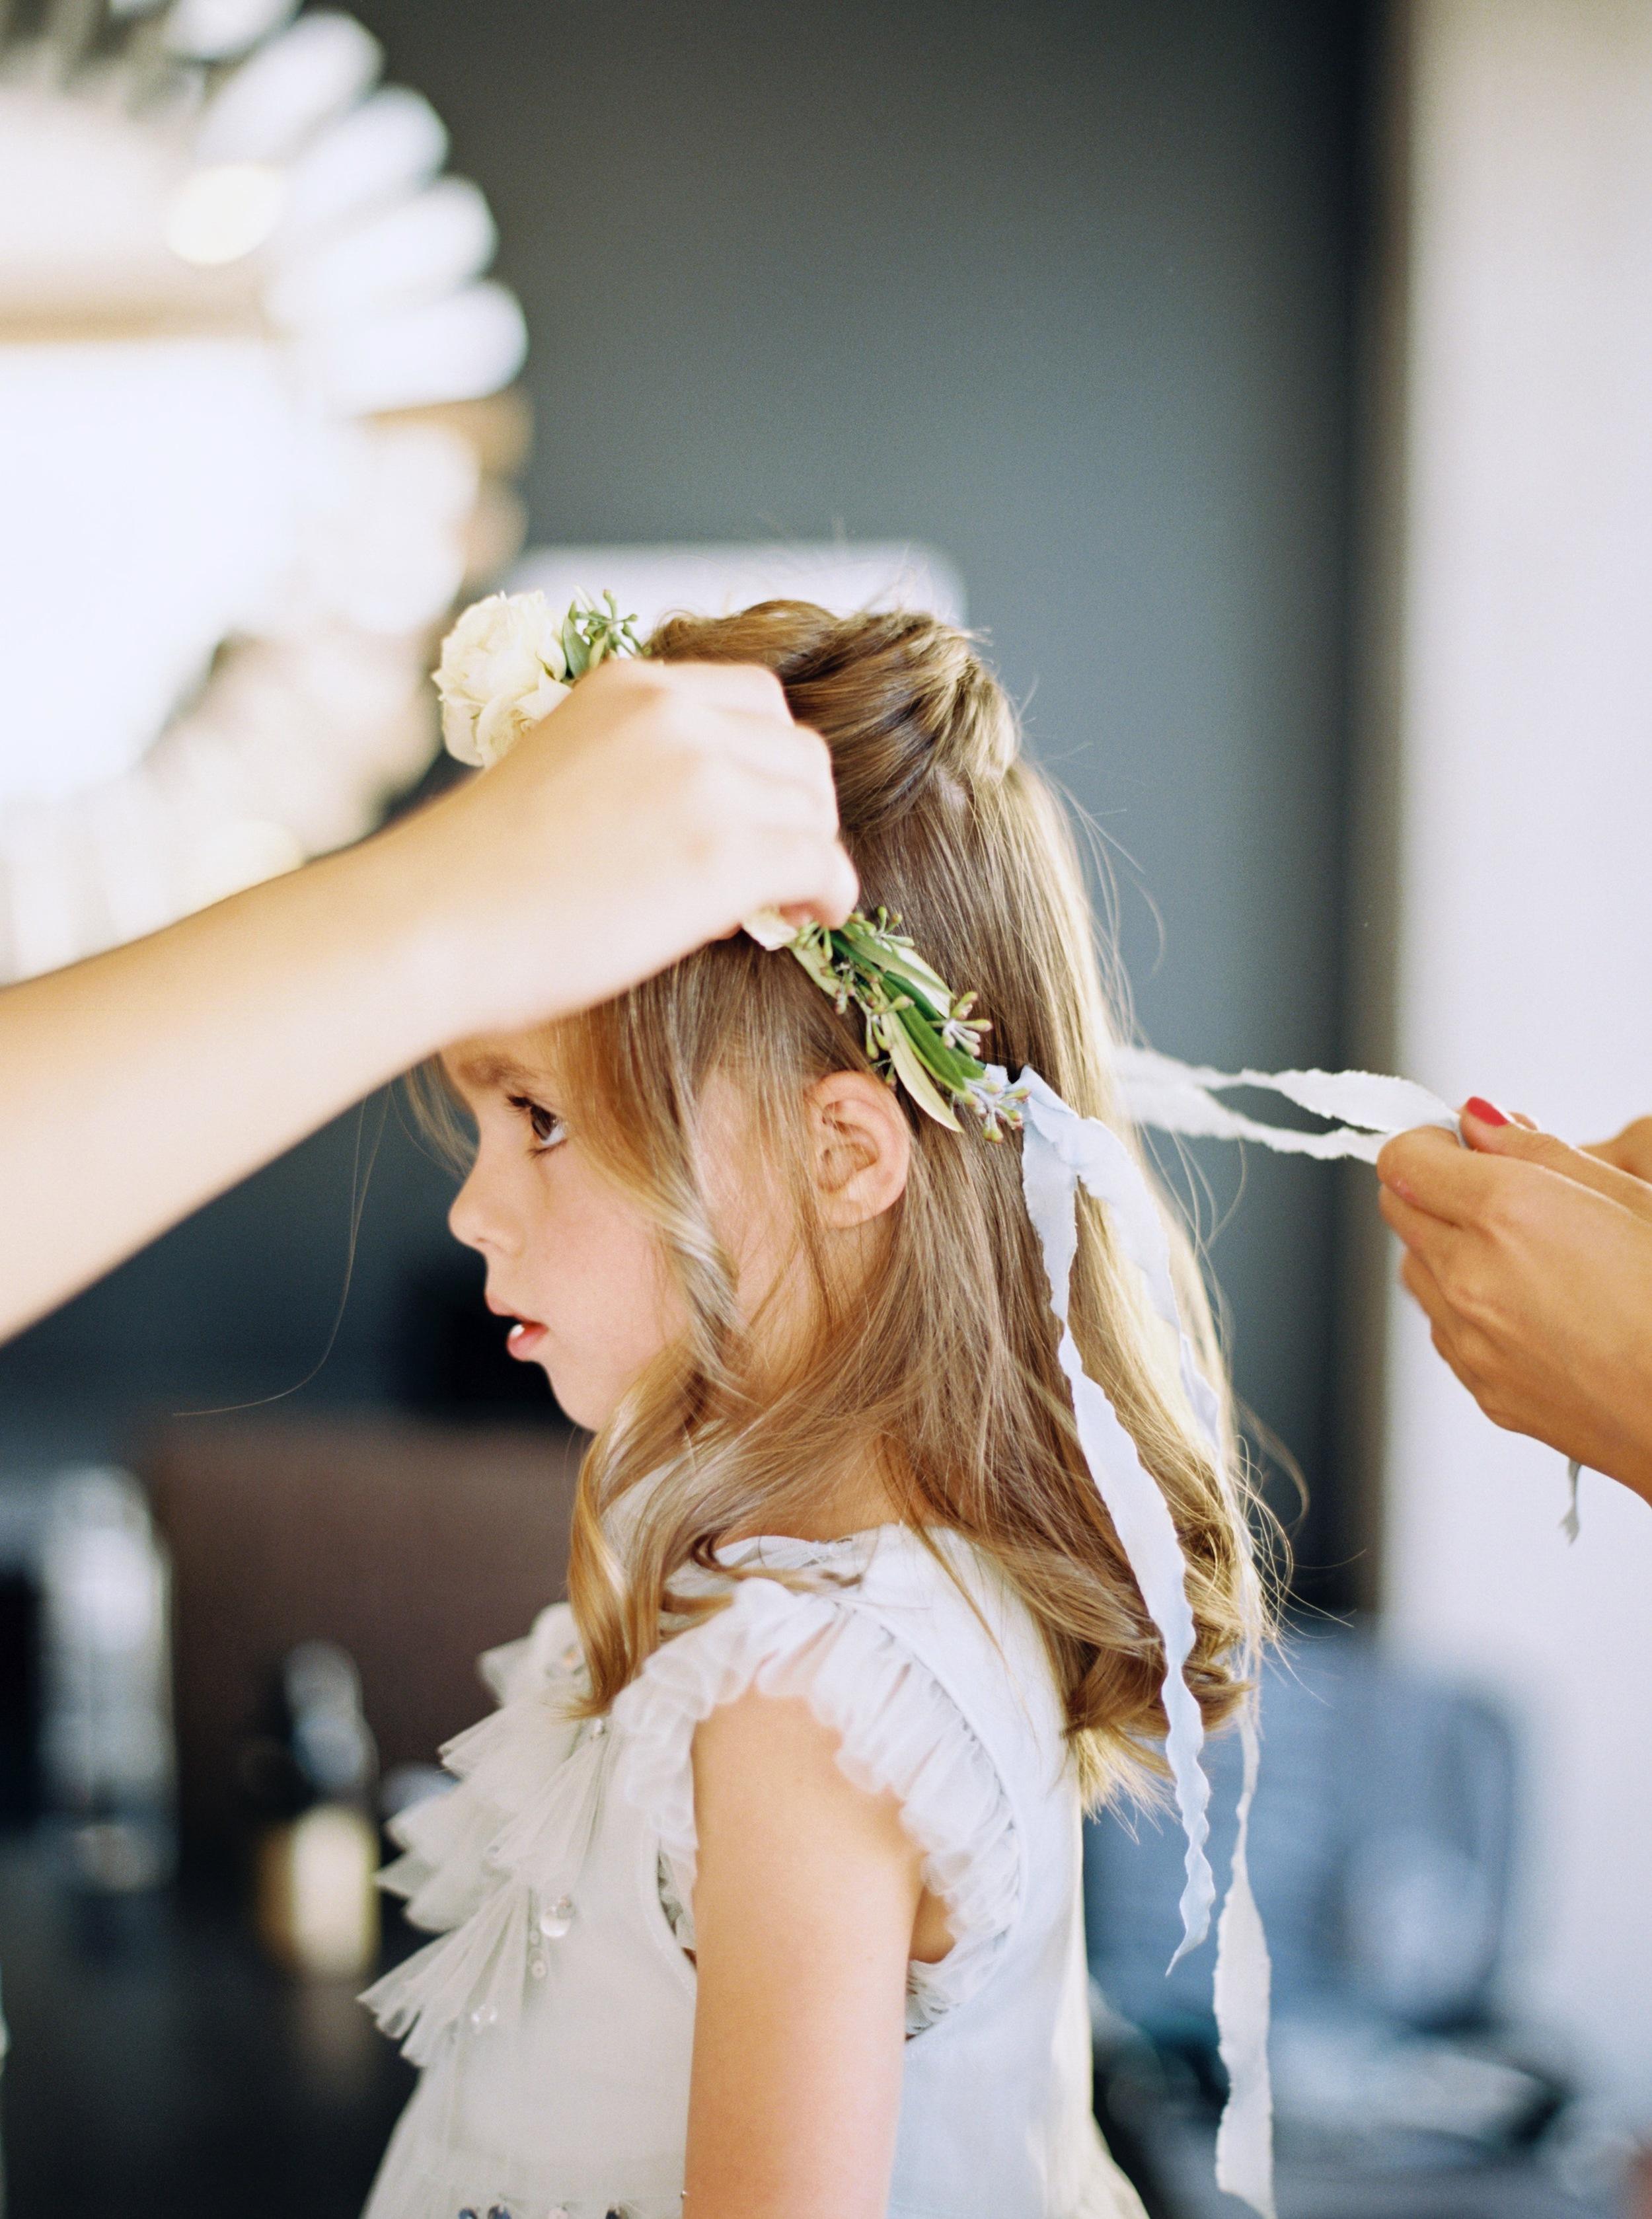 Hair and Love Bridal Portfolio by Danielle Keller | Photographer Kyle John 11.jpg